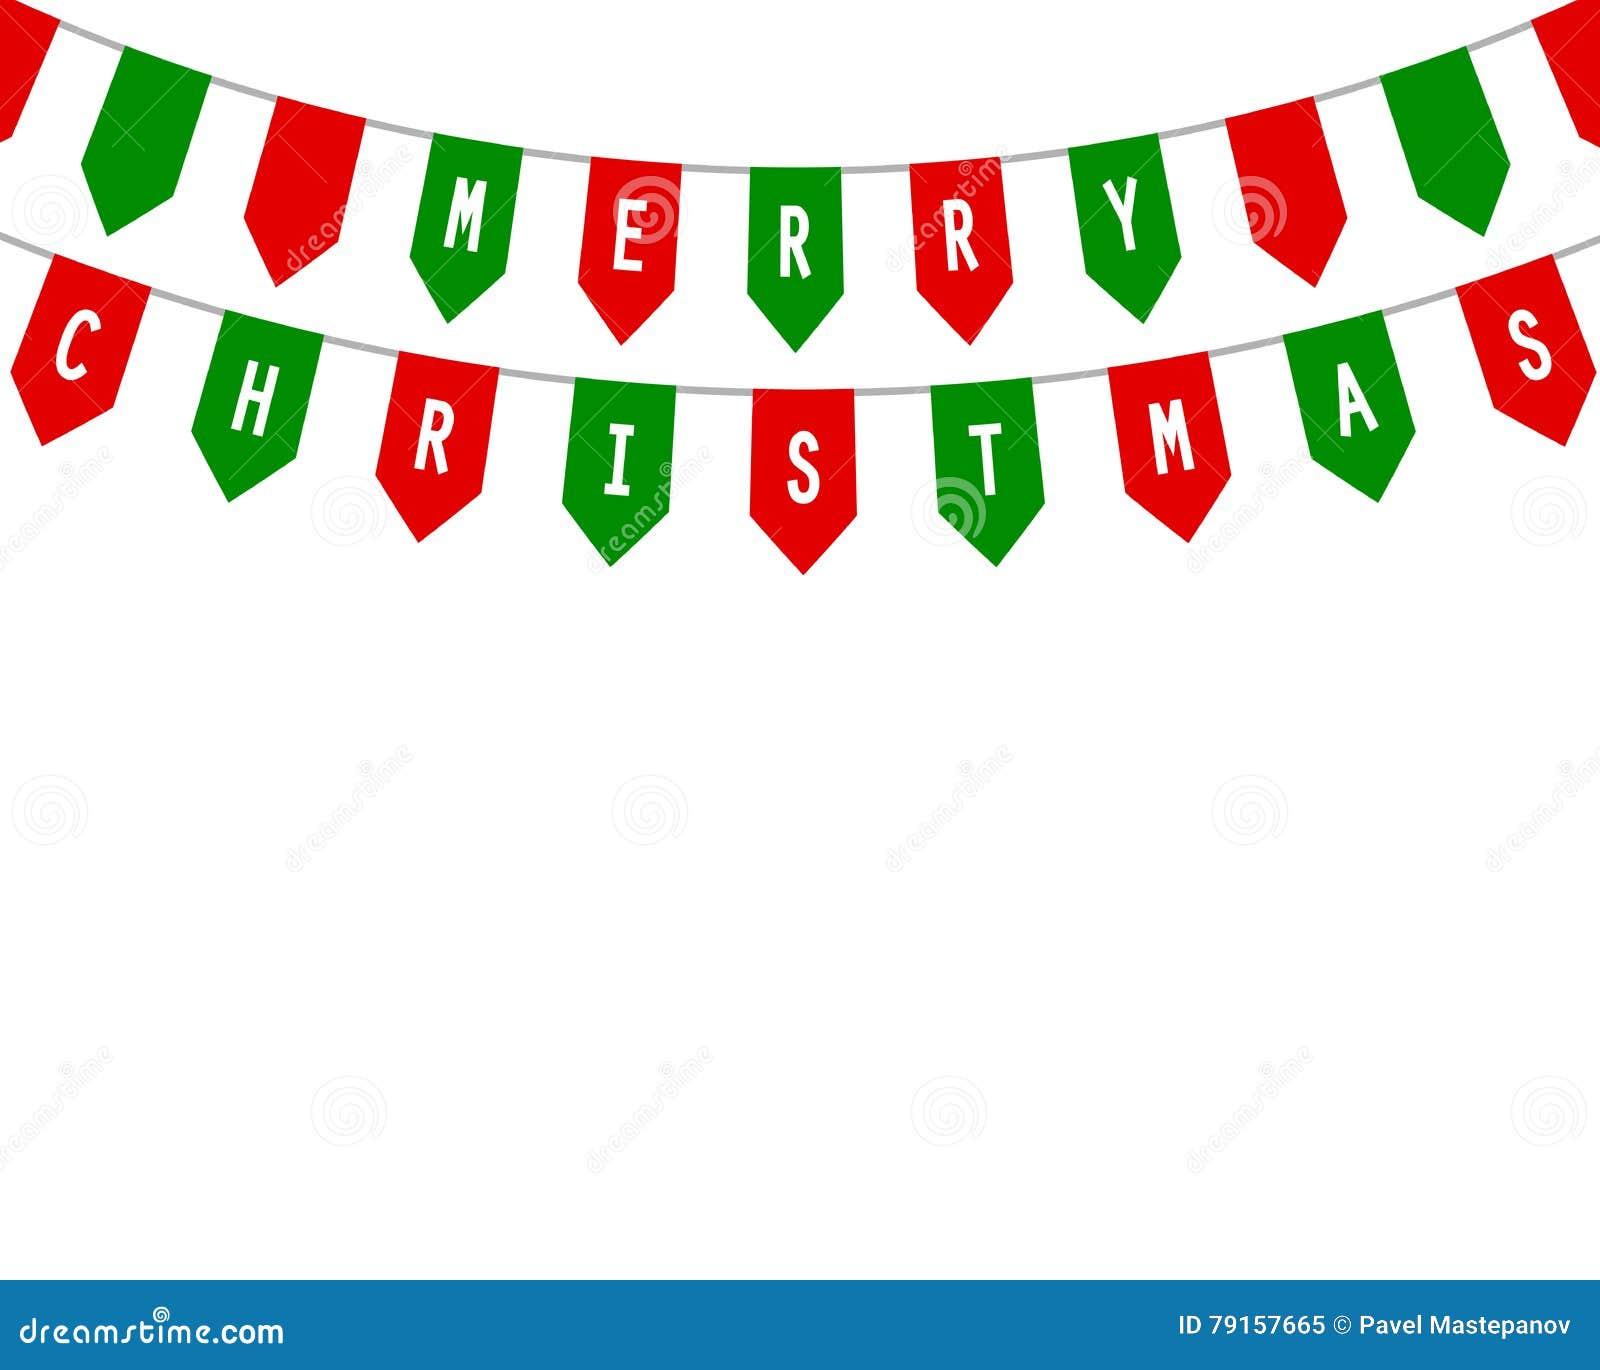 Discount decorative flags coupon